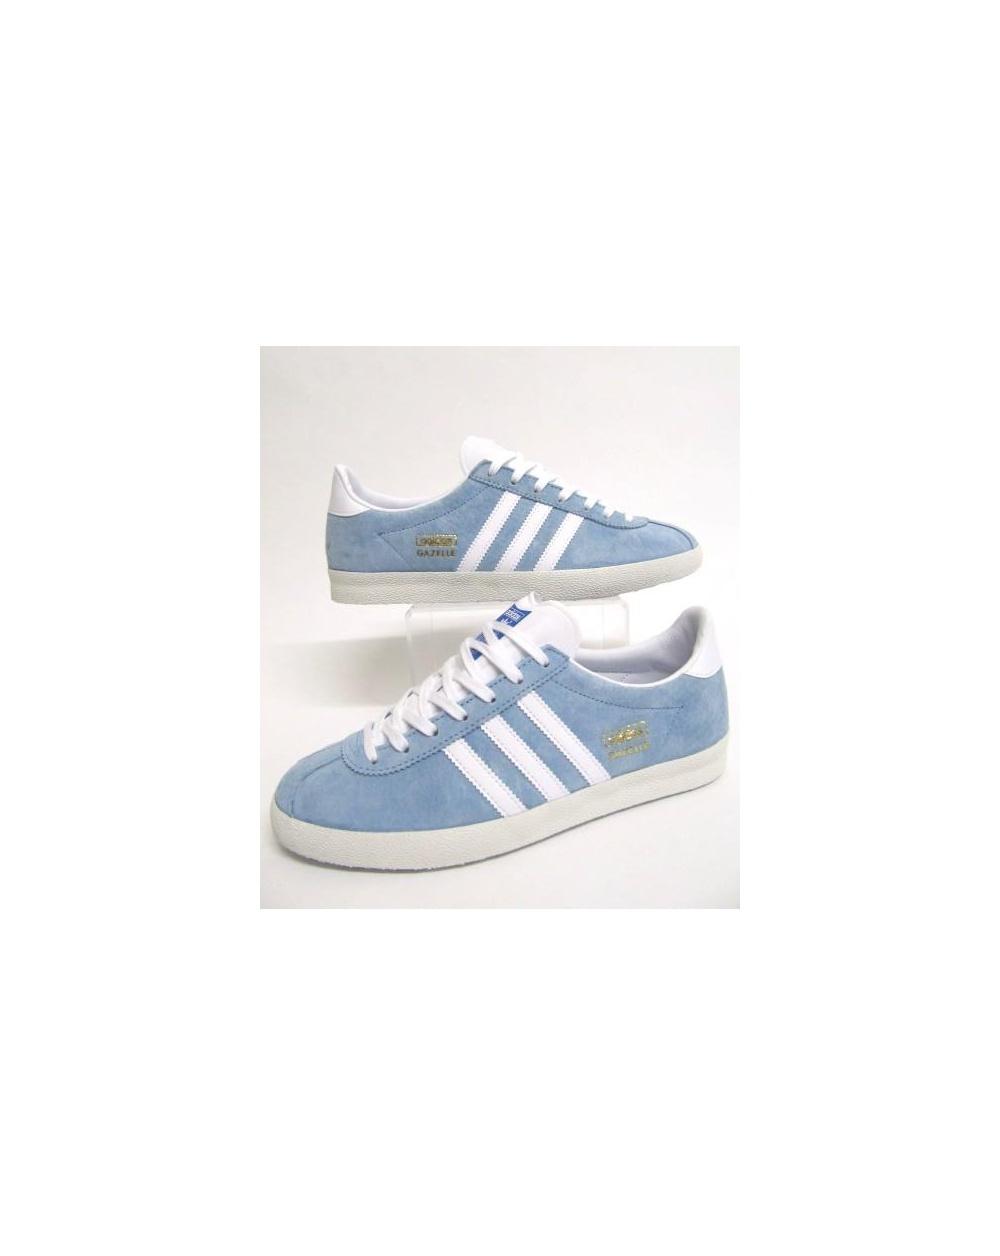 pretty nice e3cab 3c290 adidas Trainers Adidas Gazelle Og Trainers Sky Bluewhite